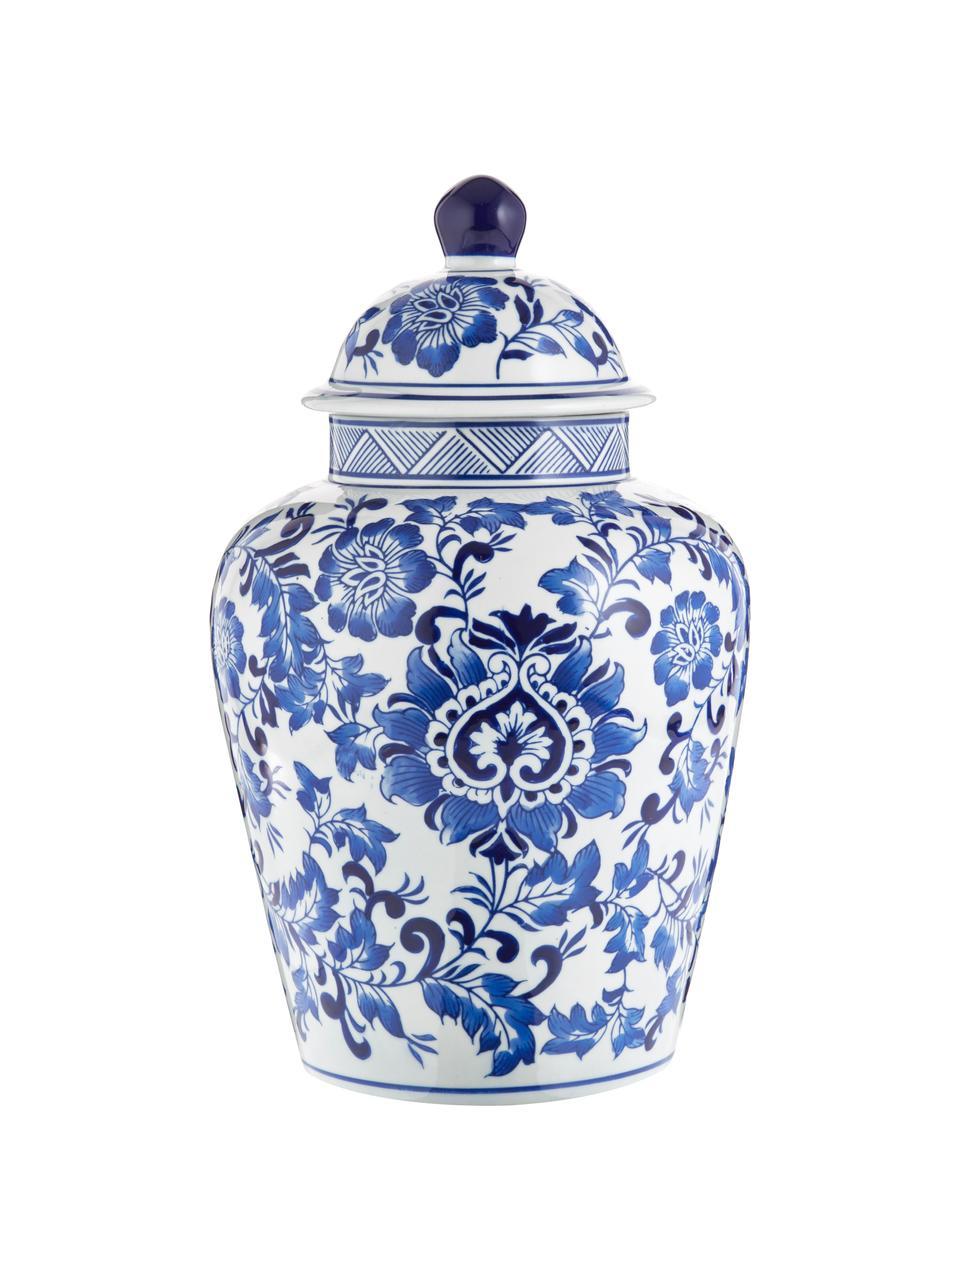 Vaso in porcellana con coperchio Annabelle, Porcellana, Blu, bianco, Ø 20 x Alt. 35 cm